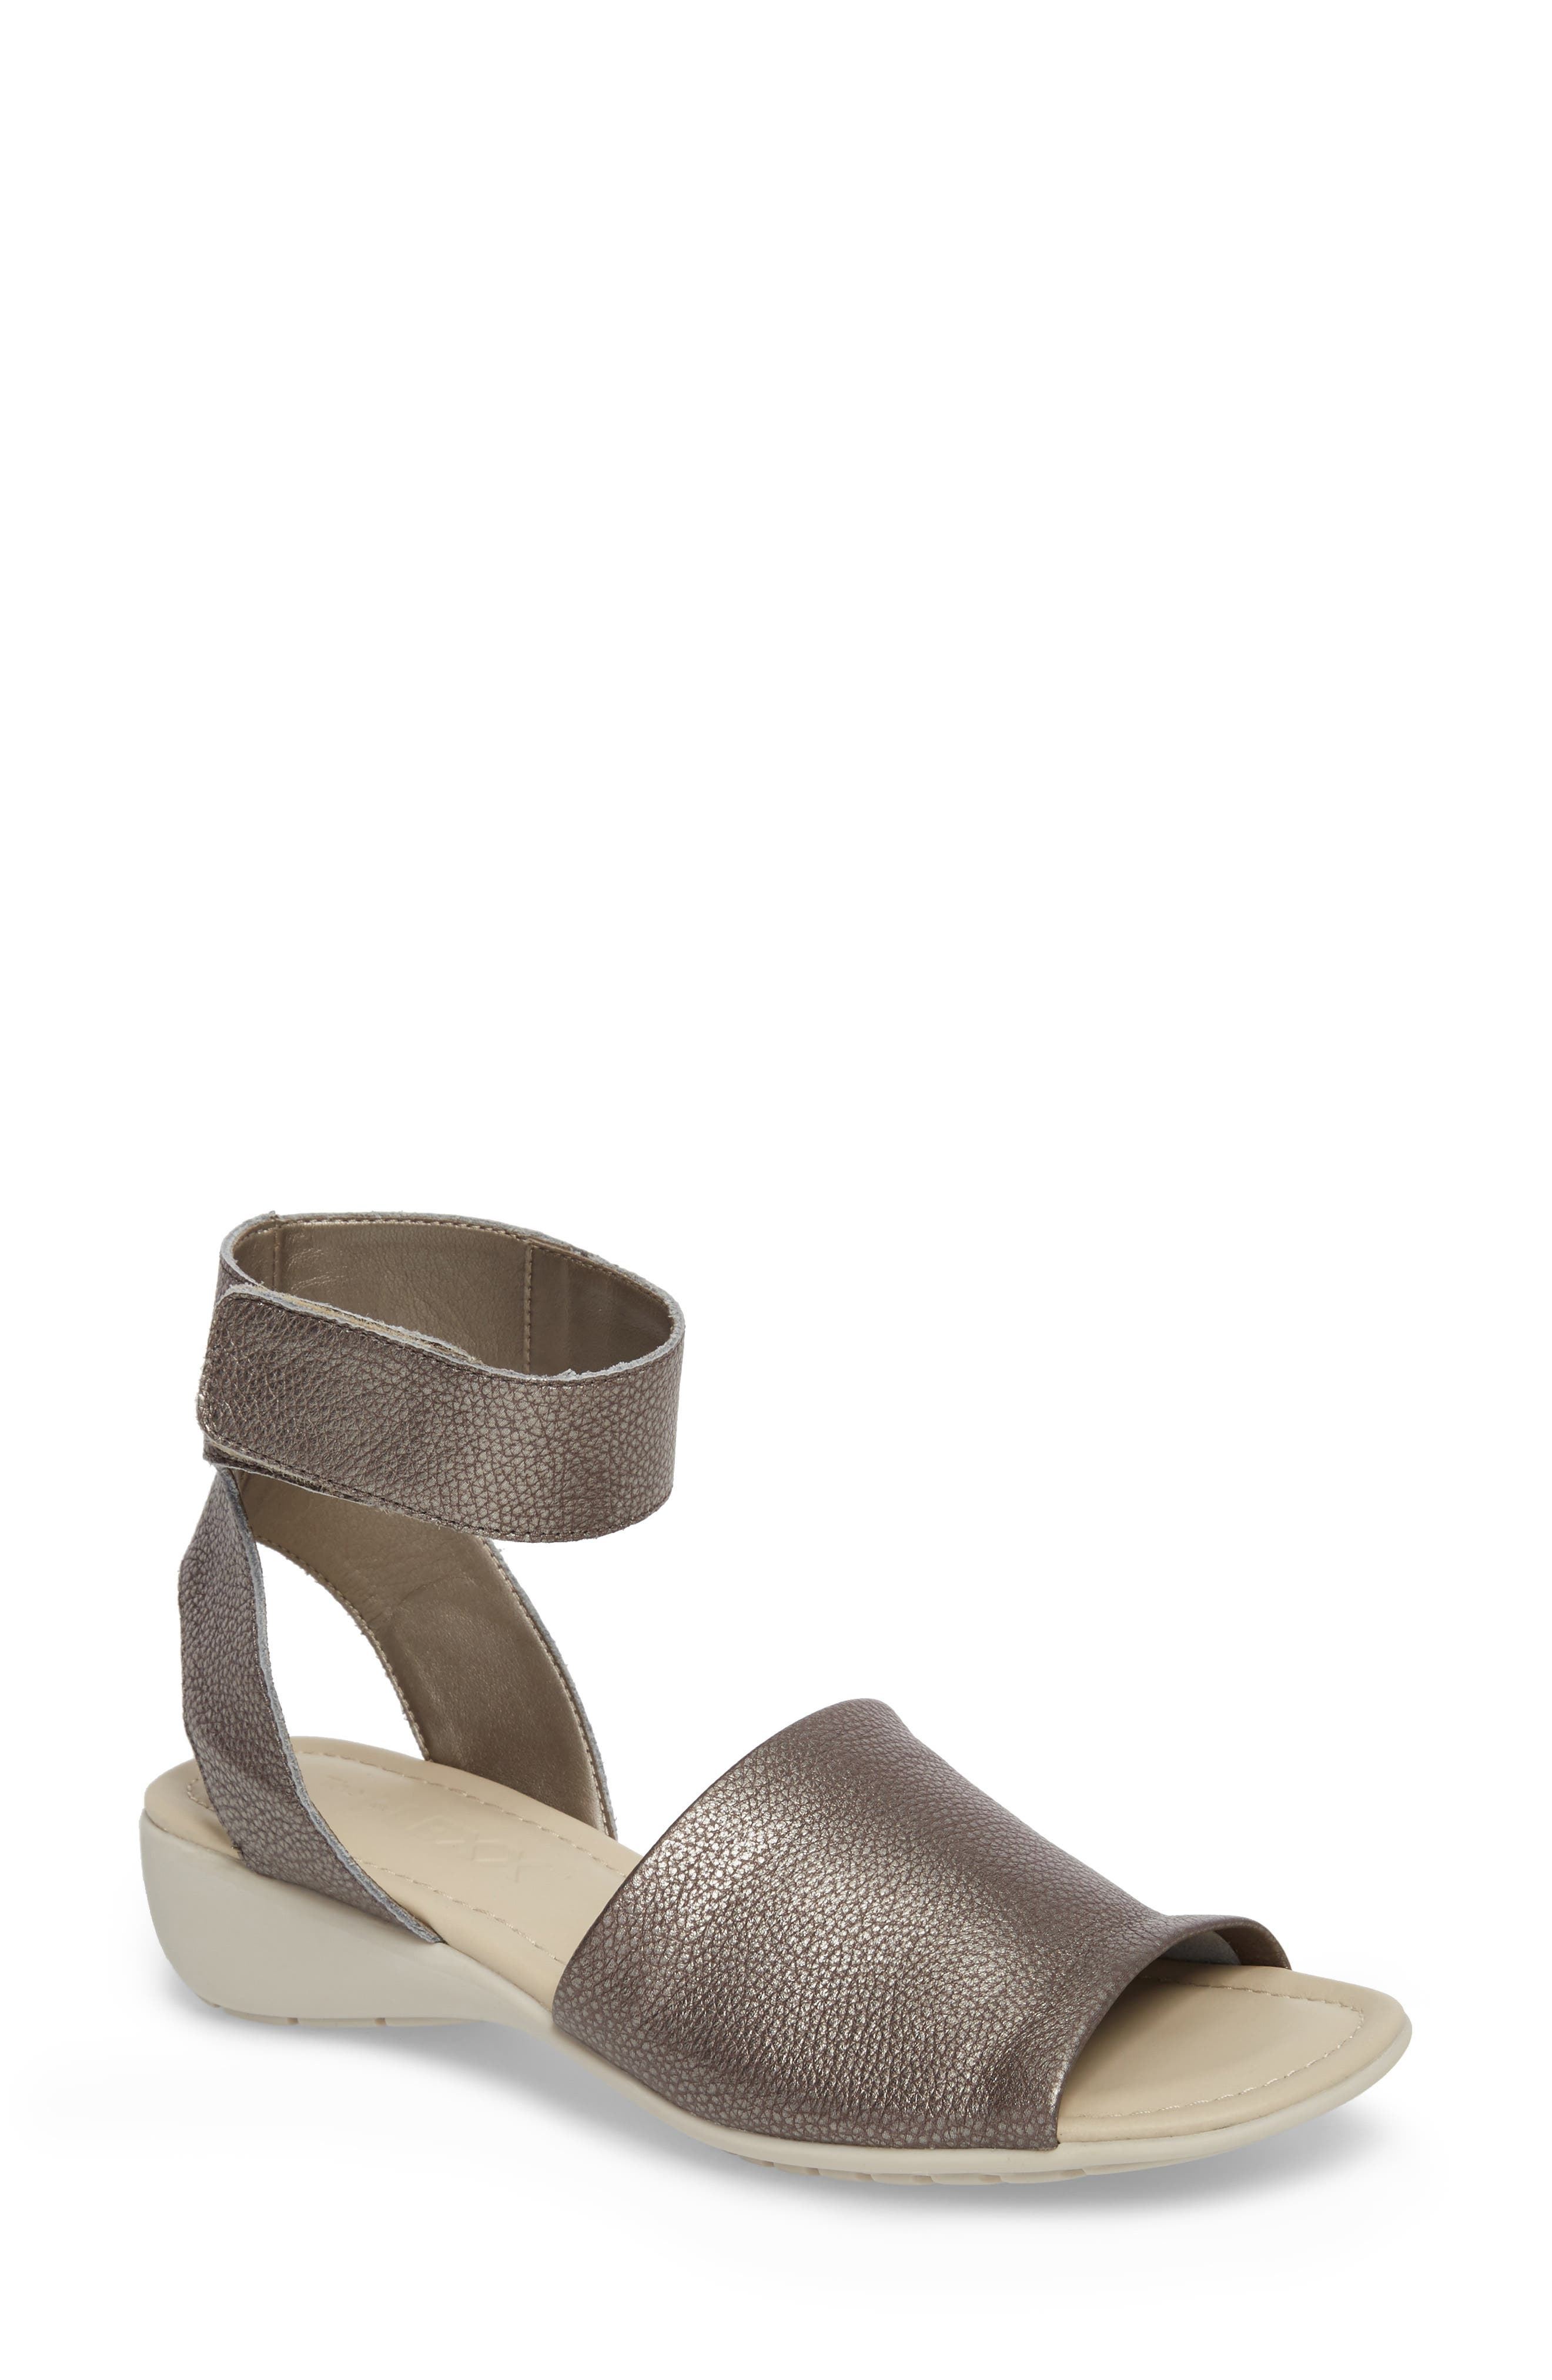 'Beglad' Leather Ankle Strap Sandal,                             Main thumbnail 2, color,